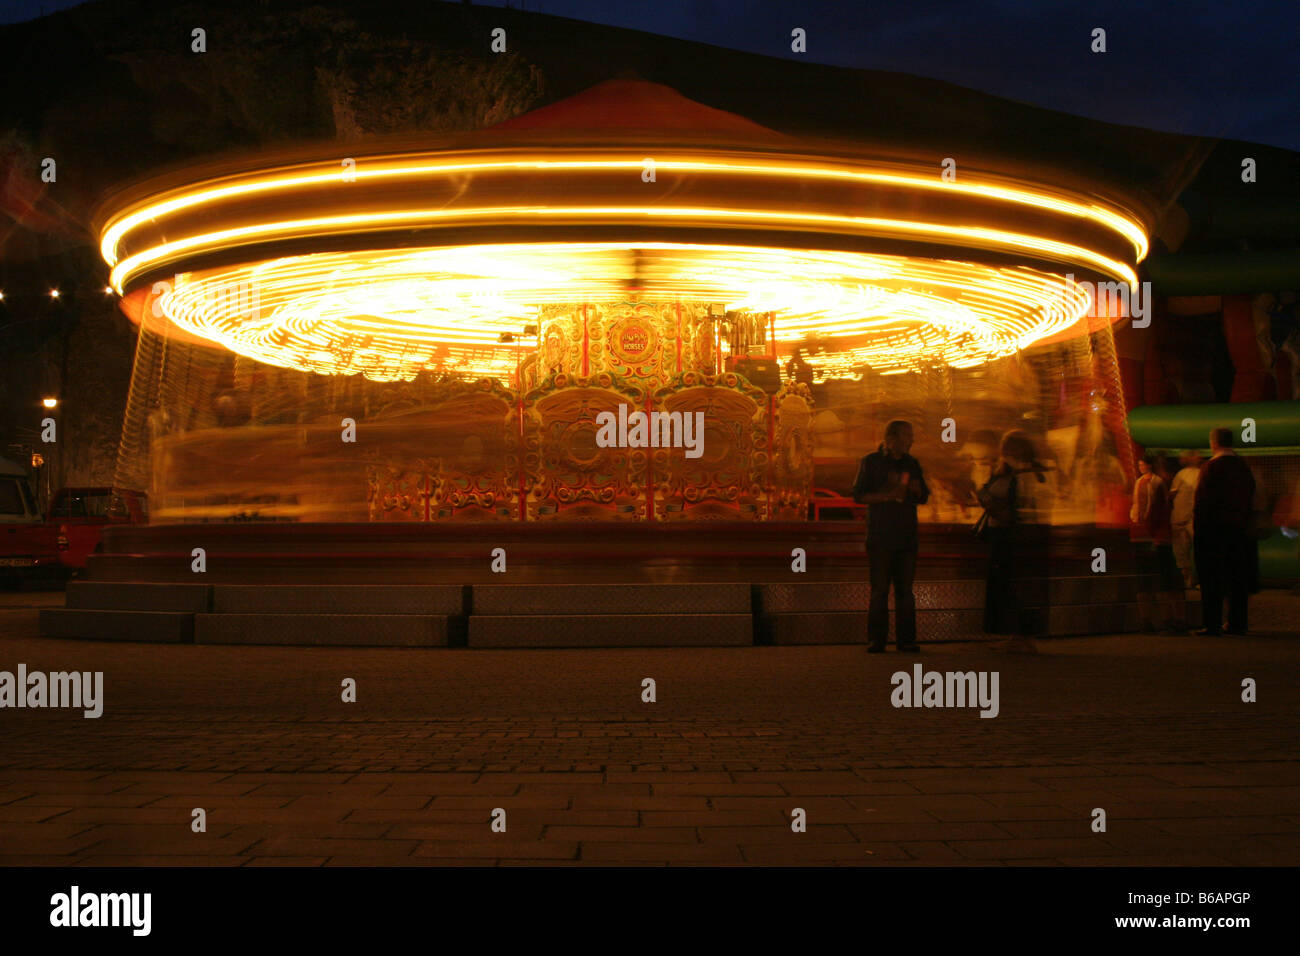 UFO or Carousel - Stock Image